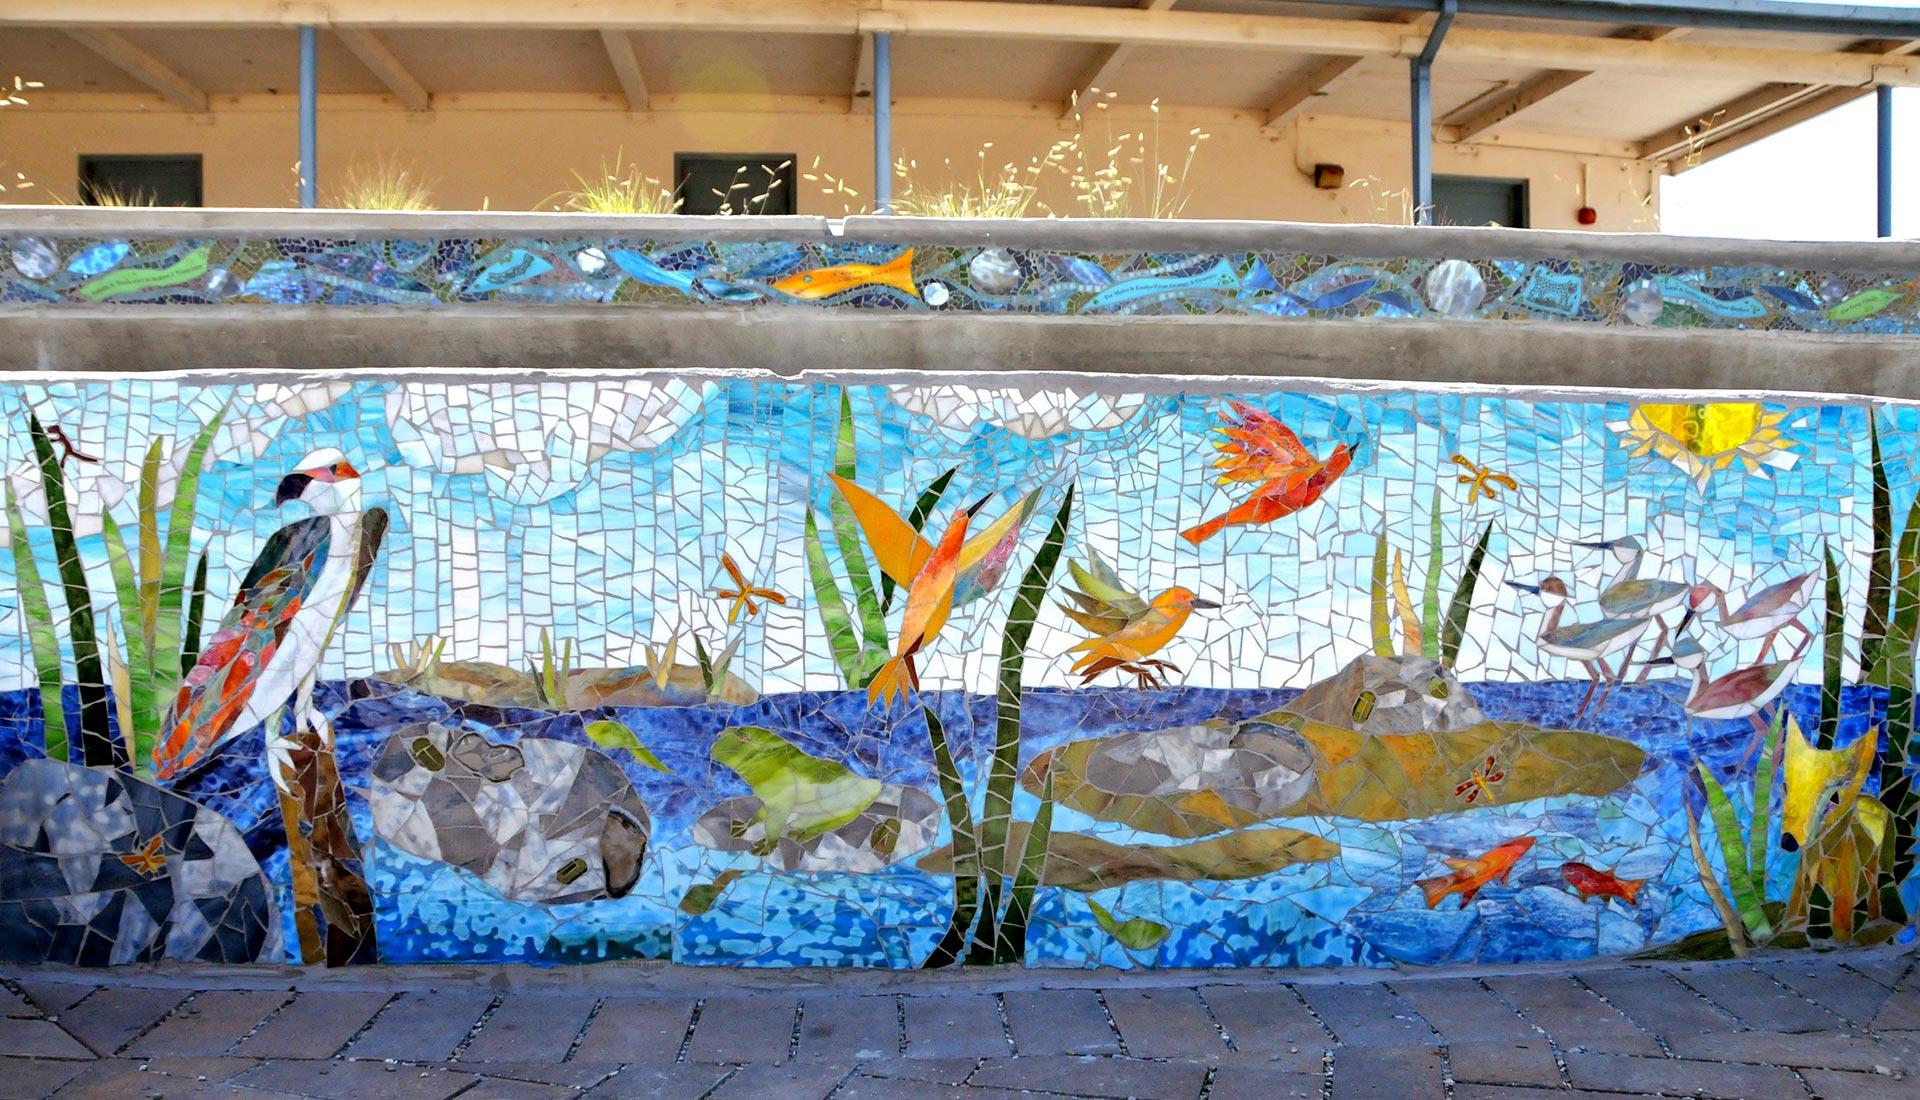 zoe mosaics - our river jewels